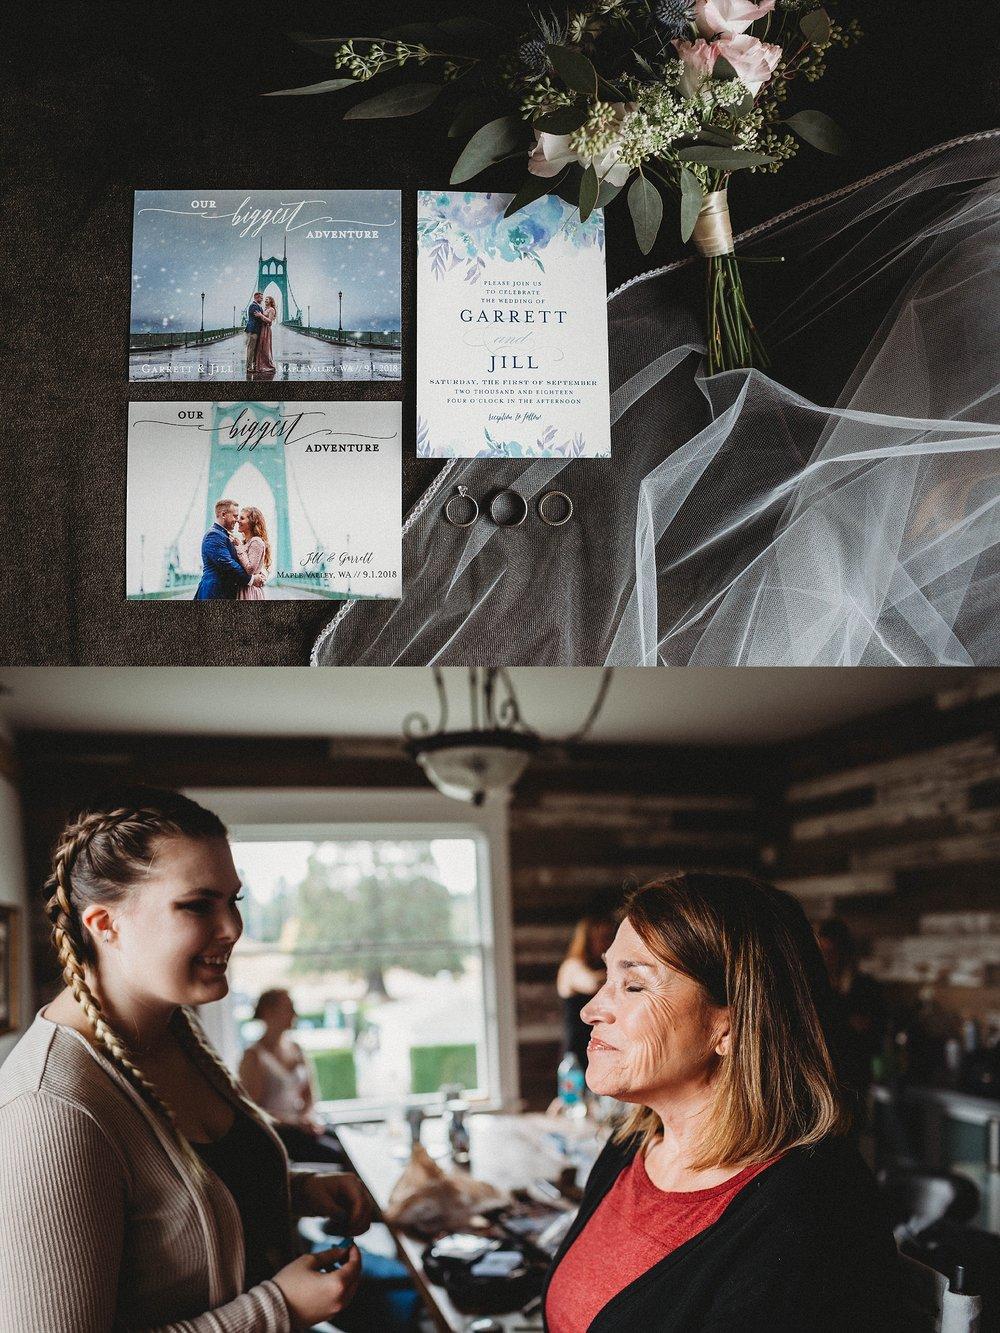 olson mansion wedding photography - jill and garrett - ashley vos photography - seattle area wedding photographer-11.jpg